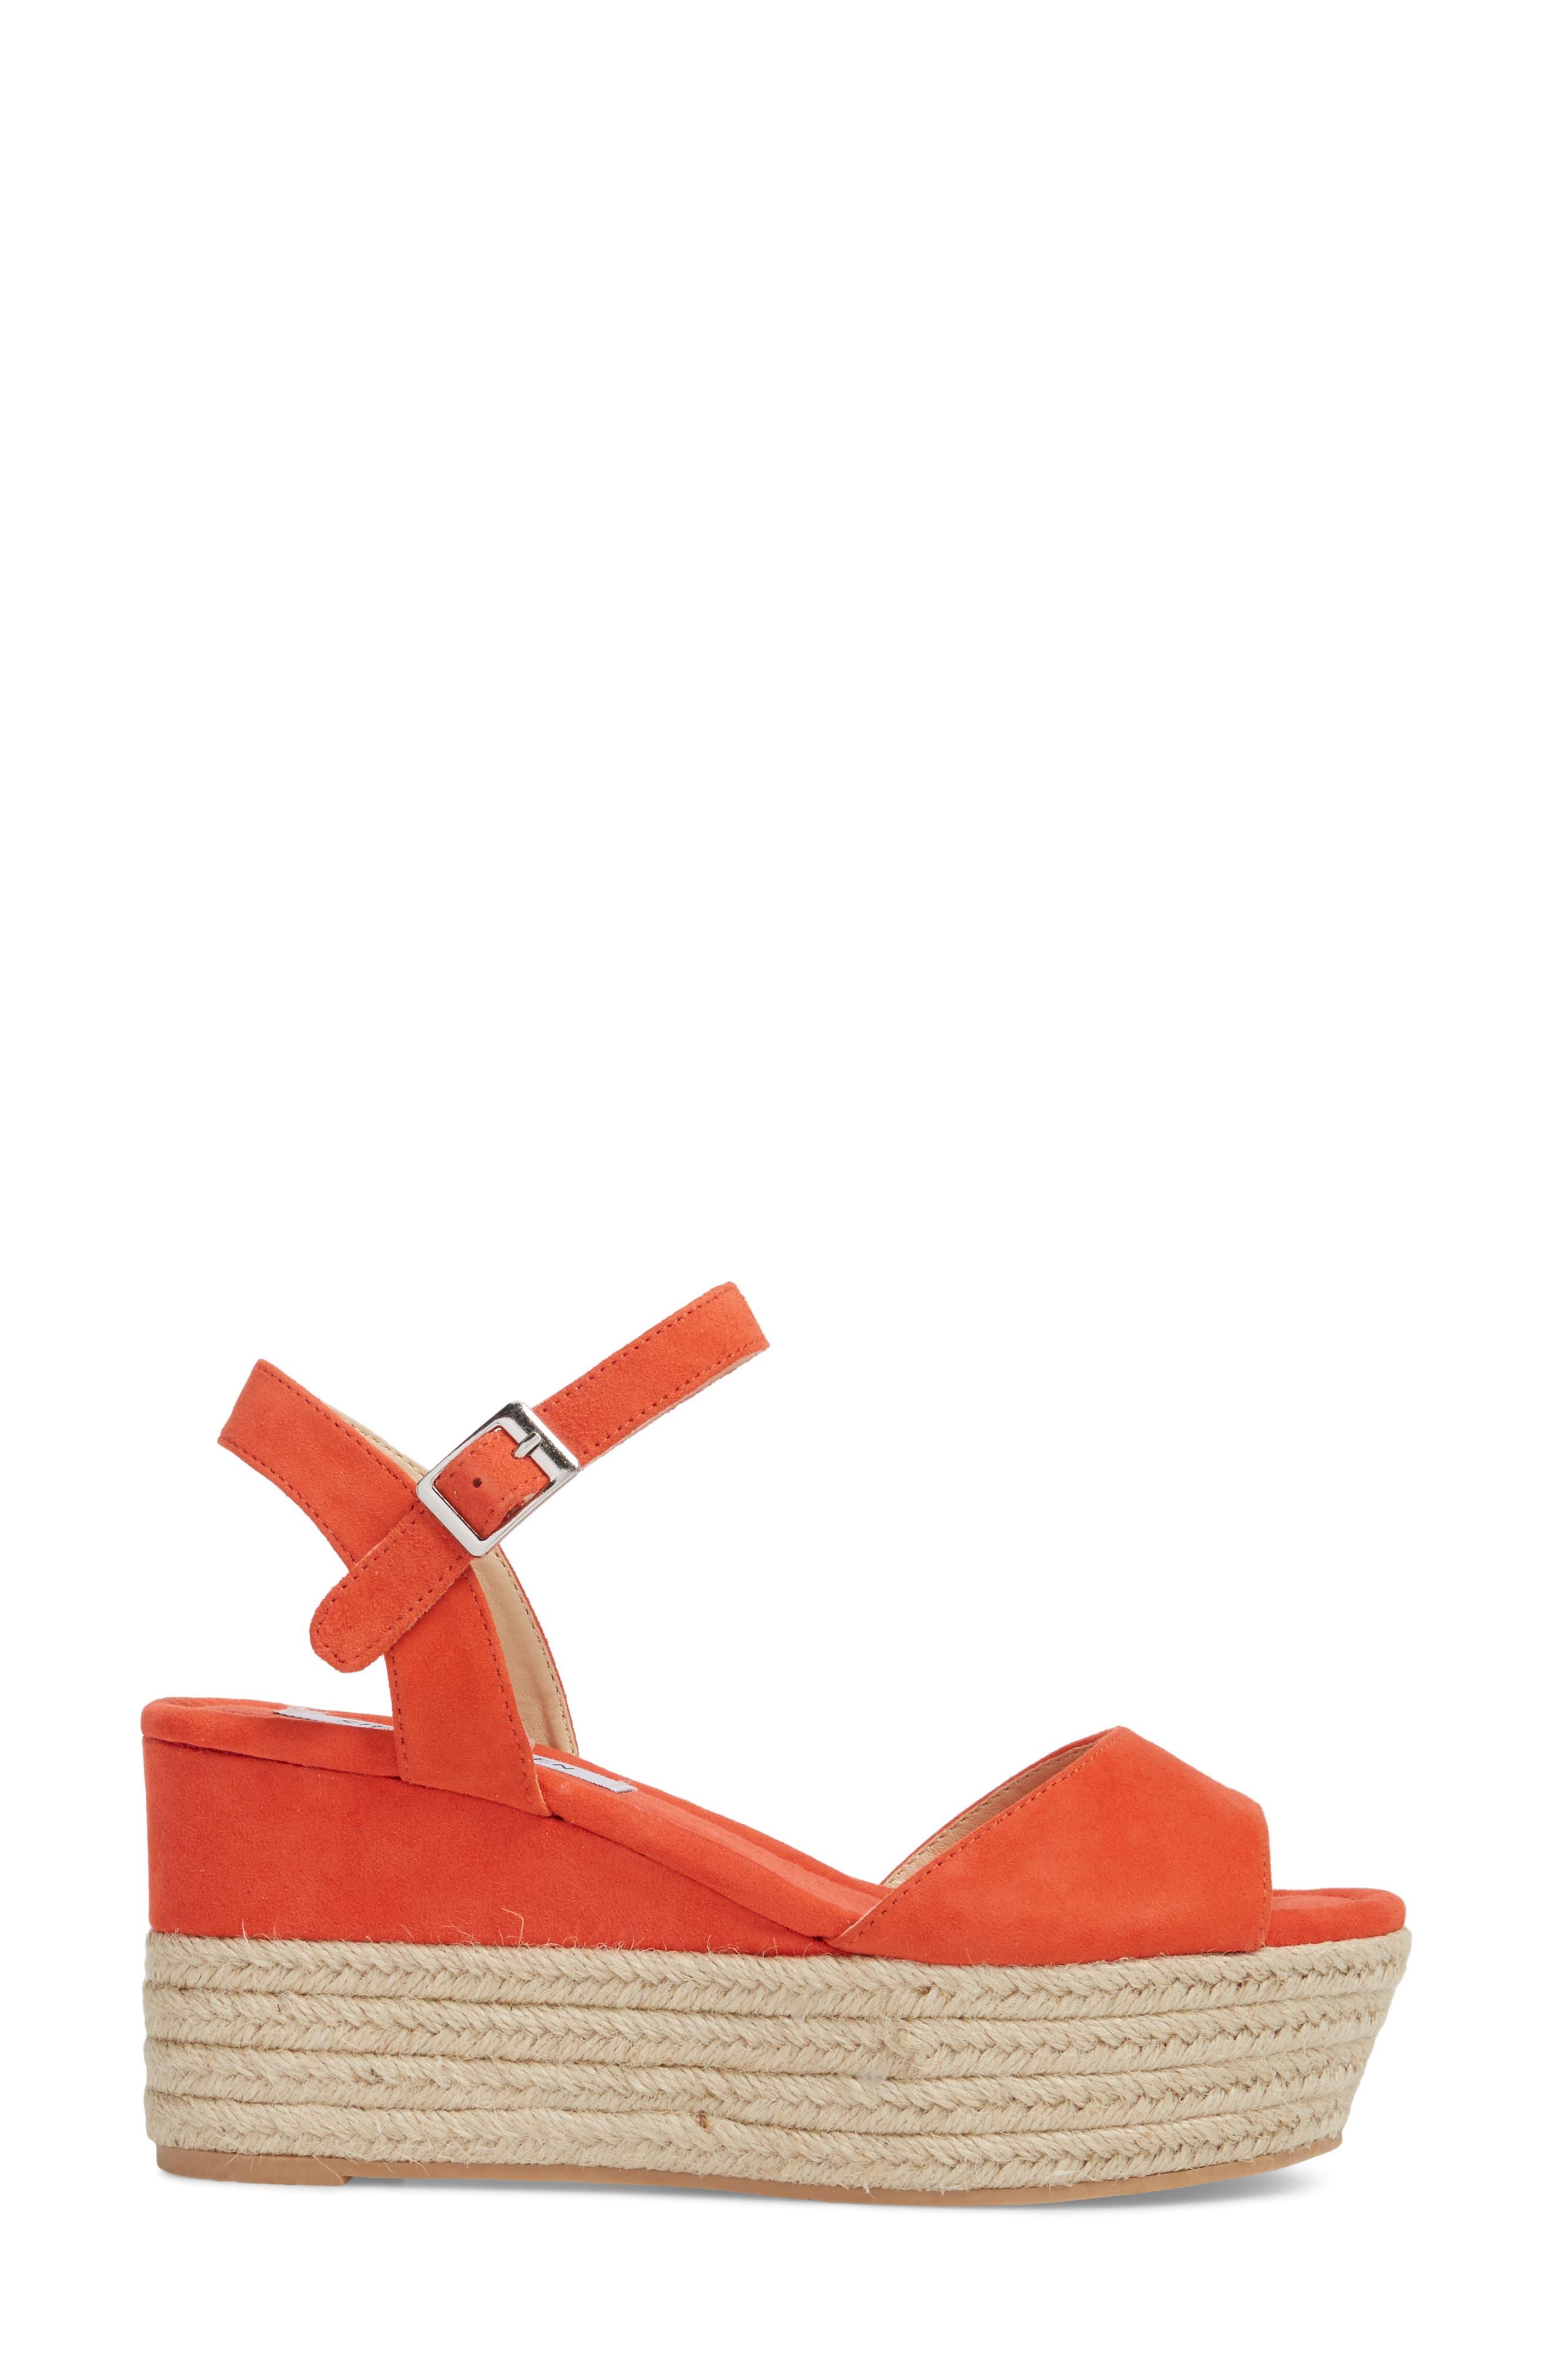 Kianna Espadrille Wedge Sandal,                             Alternate thumbnail 3, color,                             Coral Suede